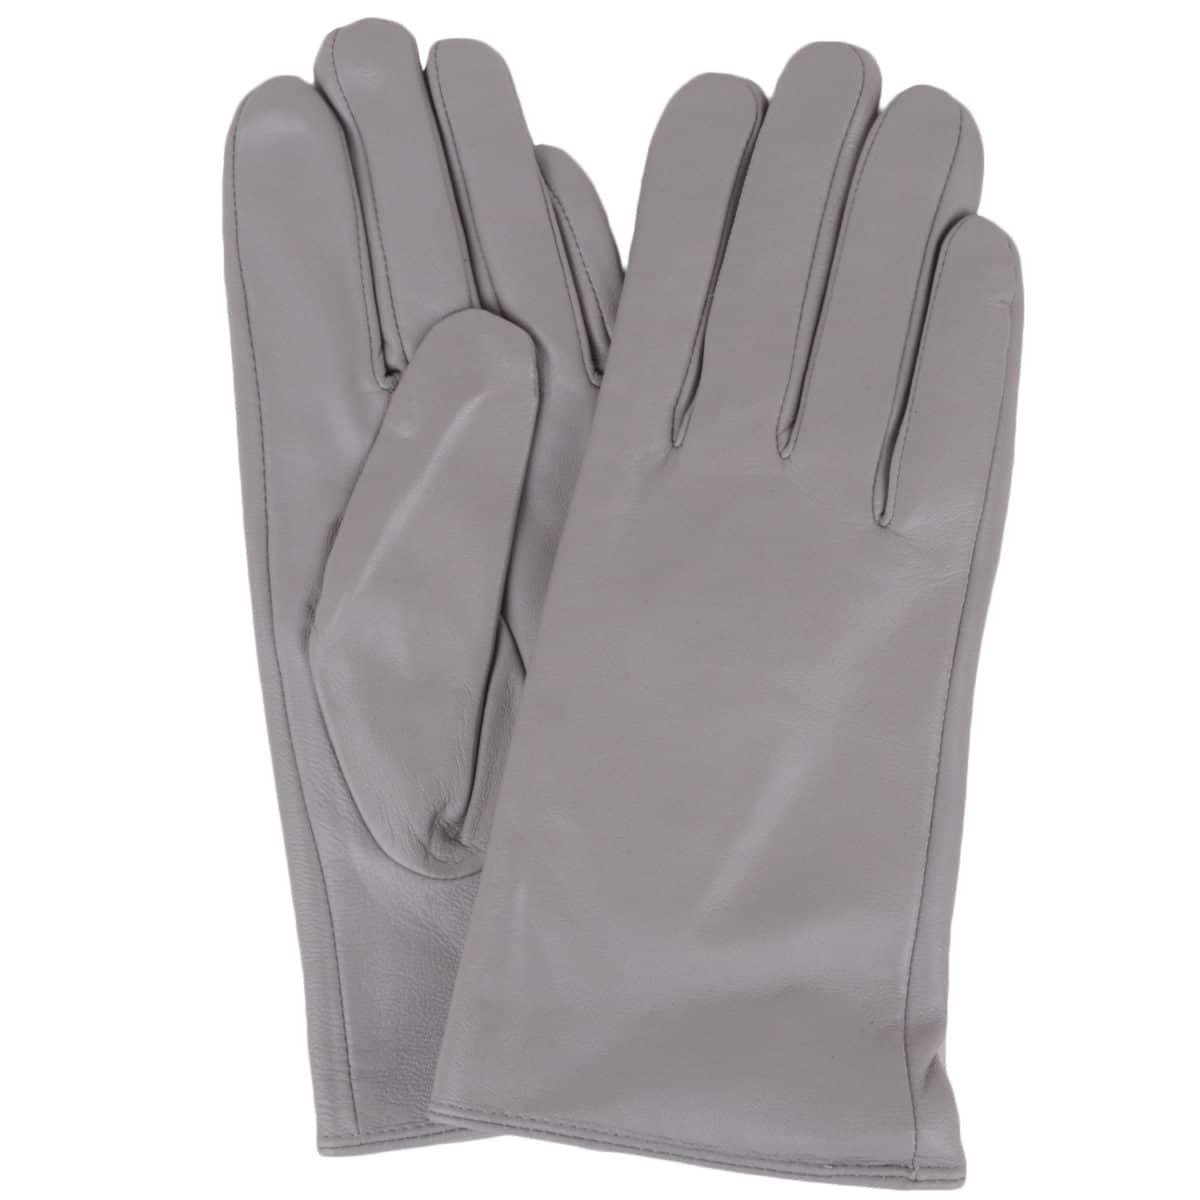 Tamara - Leather Gloves - Grey